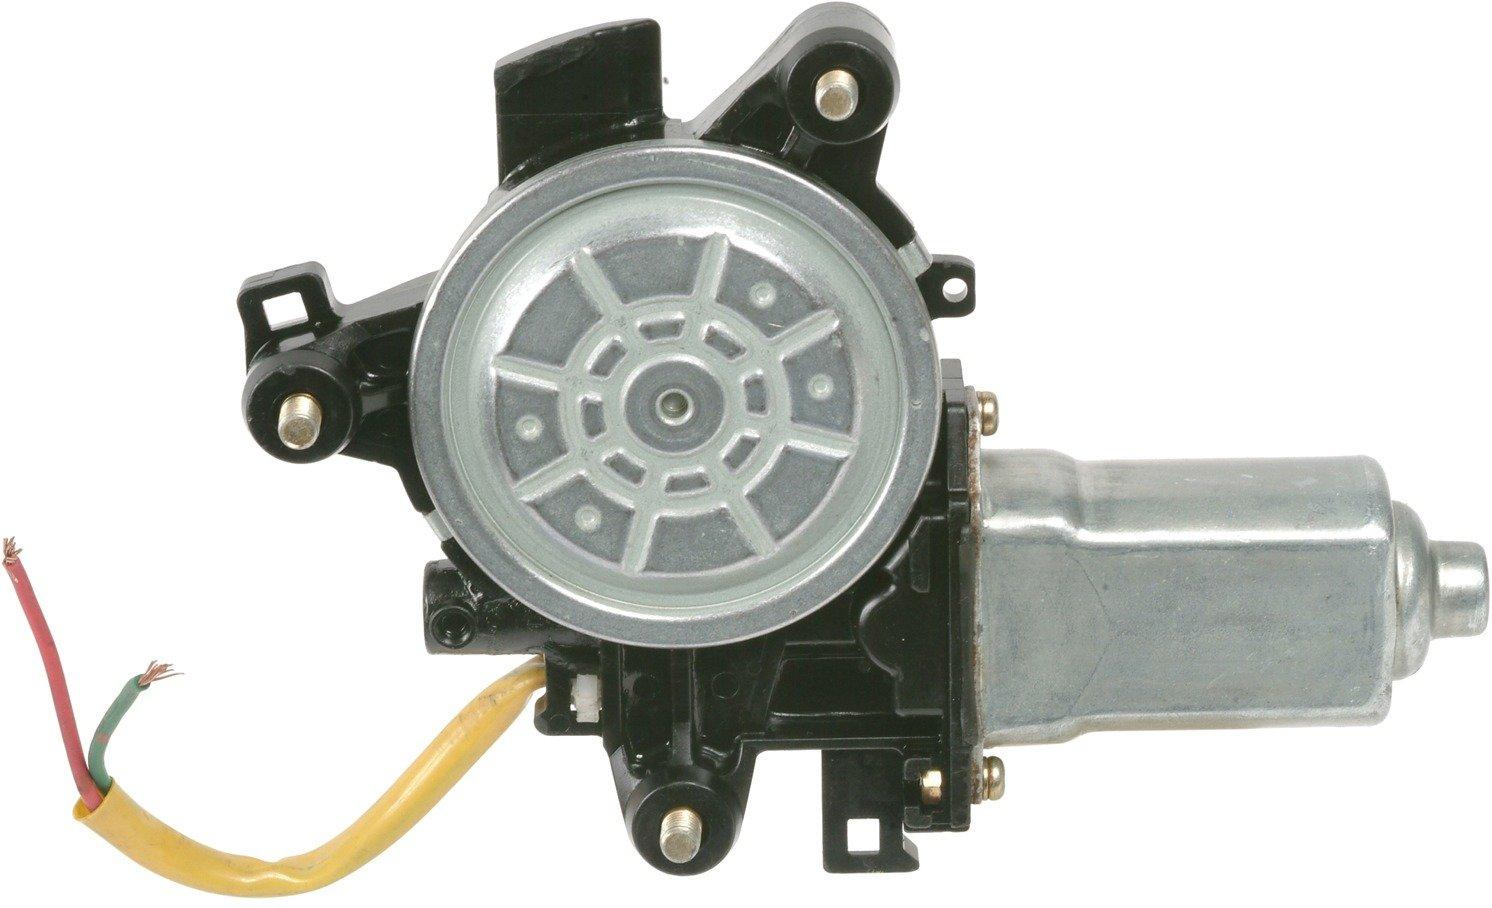 Cardone 47-10018 Remanufactured Import Window Lift Motor ...